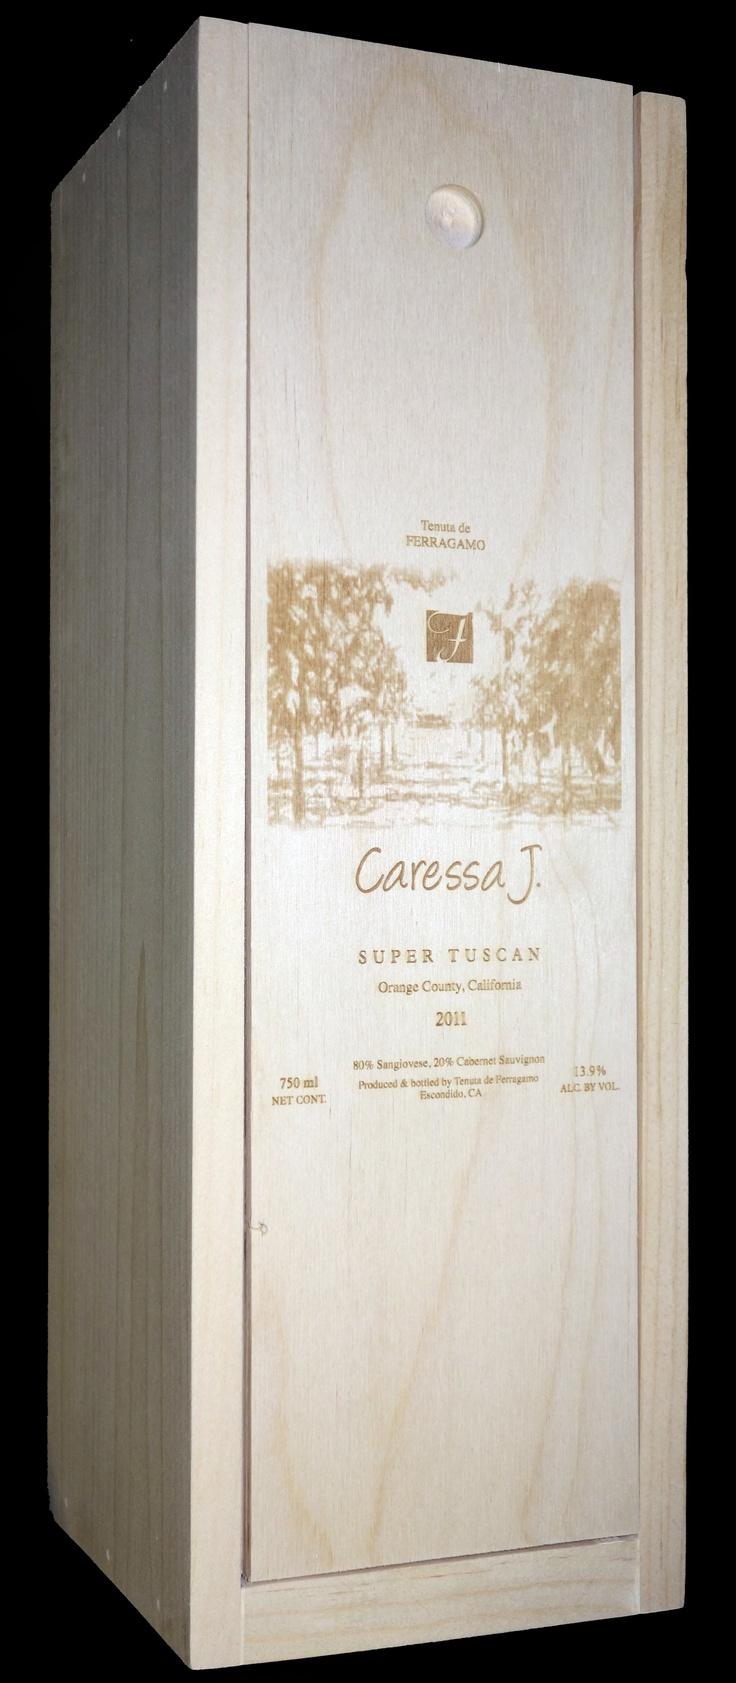 Caressa J. Ferragamo Vineyards Single Bottle Wooden Wine Crate